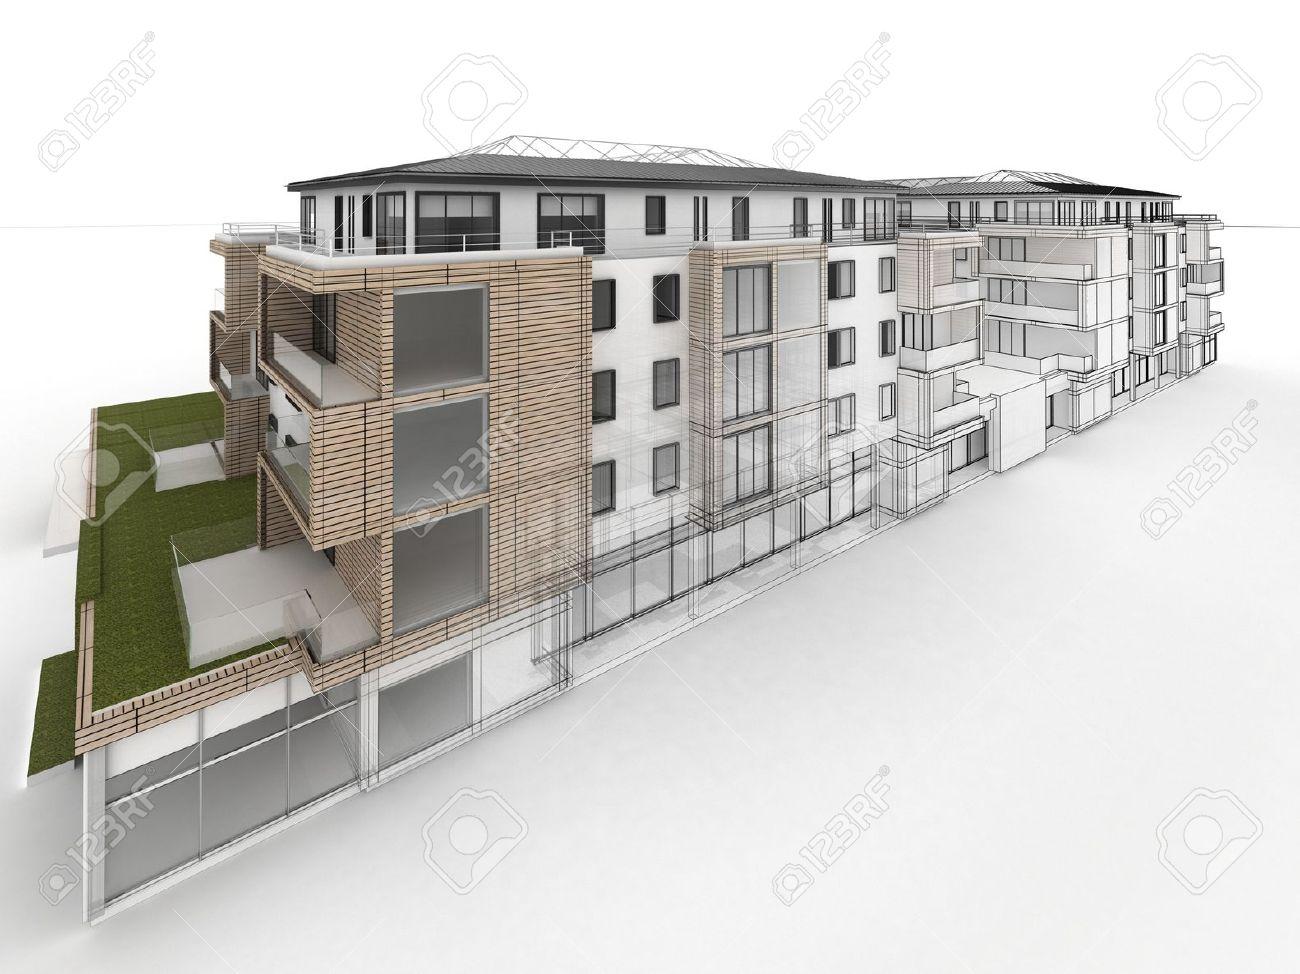 apartment building design progress, architecture visualization